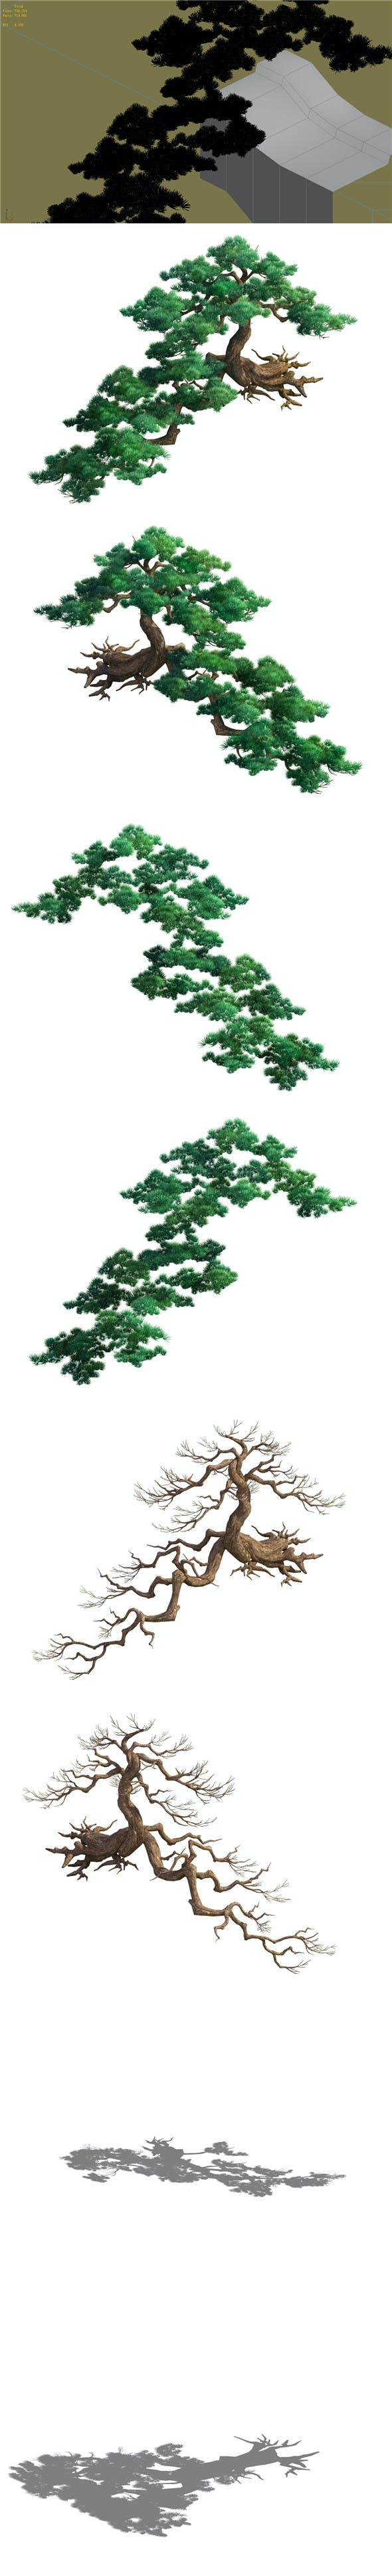 Game Model - Taoist comprehension scene - Pine 01 - 3DOcean Item for Sale